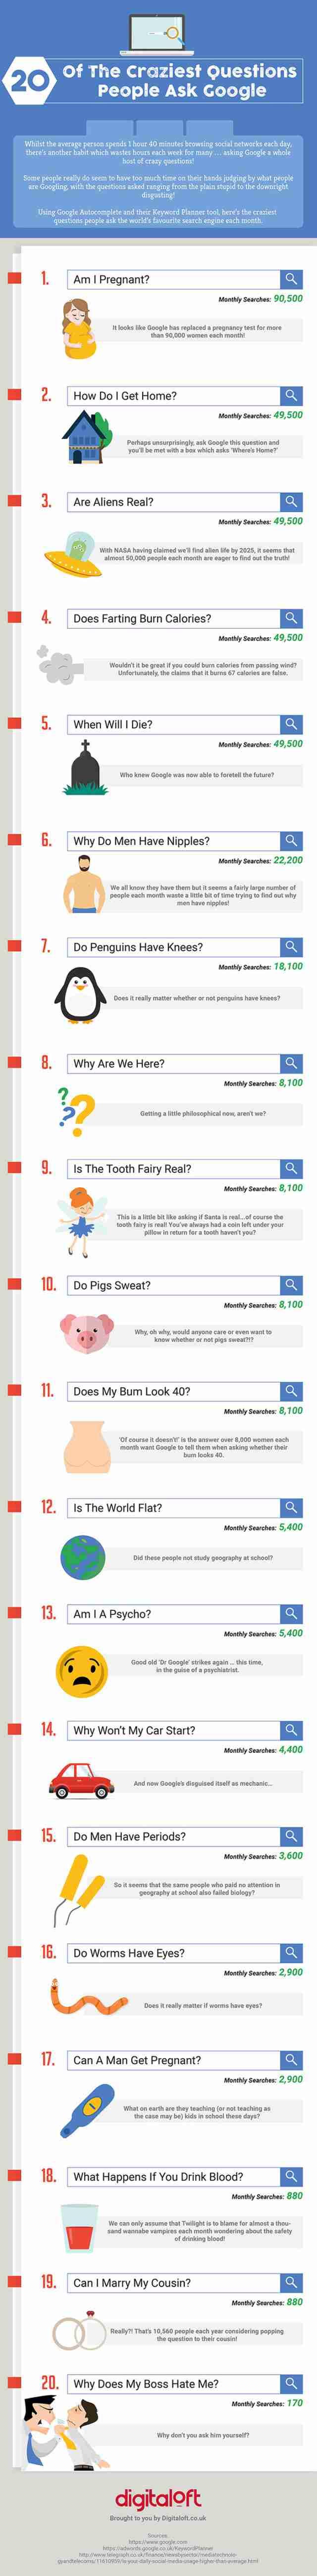 google recherches bizarres